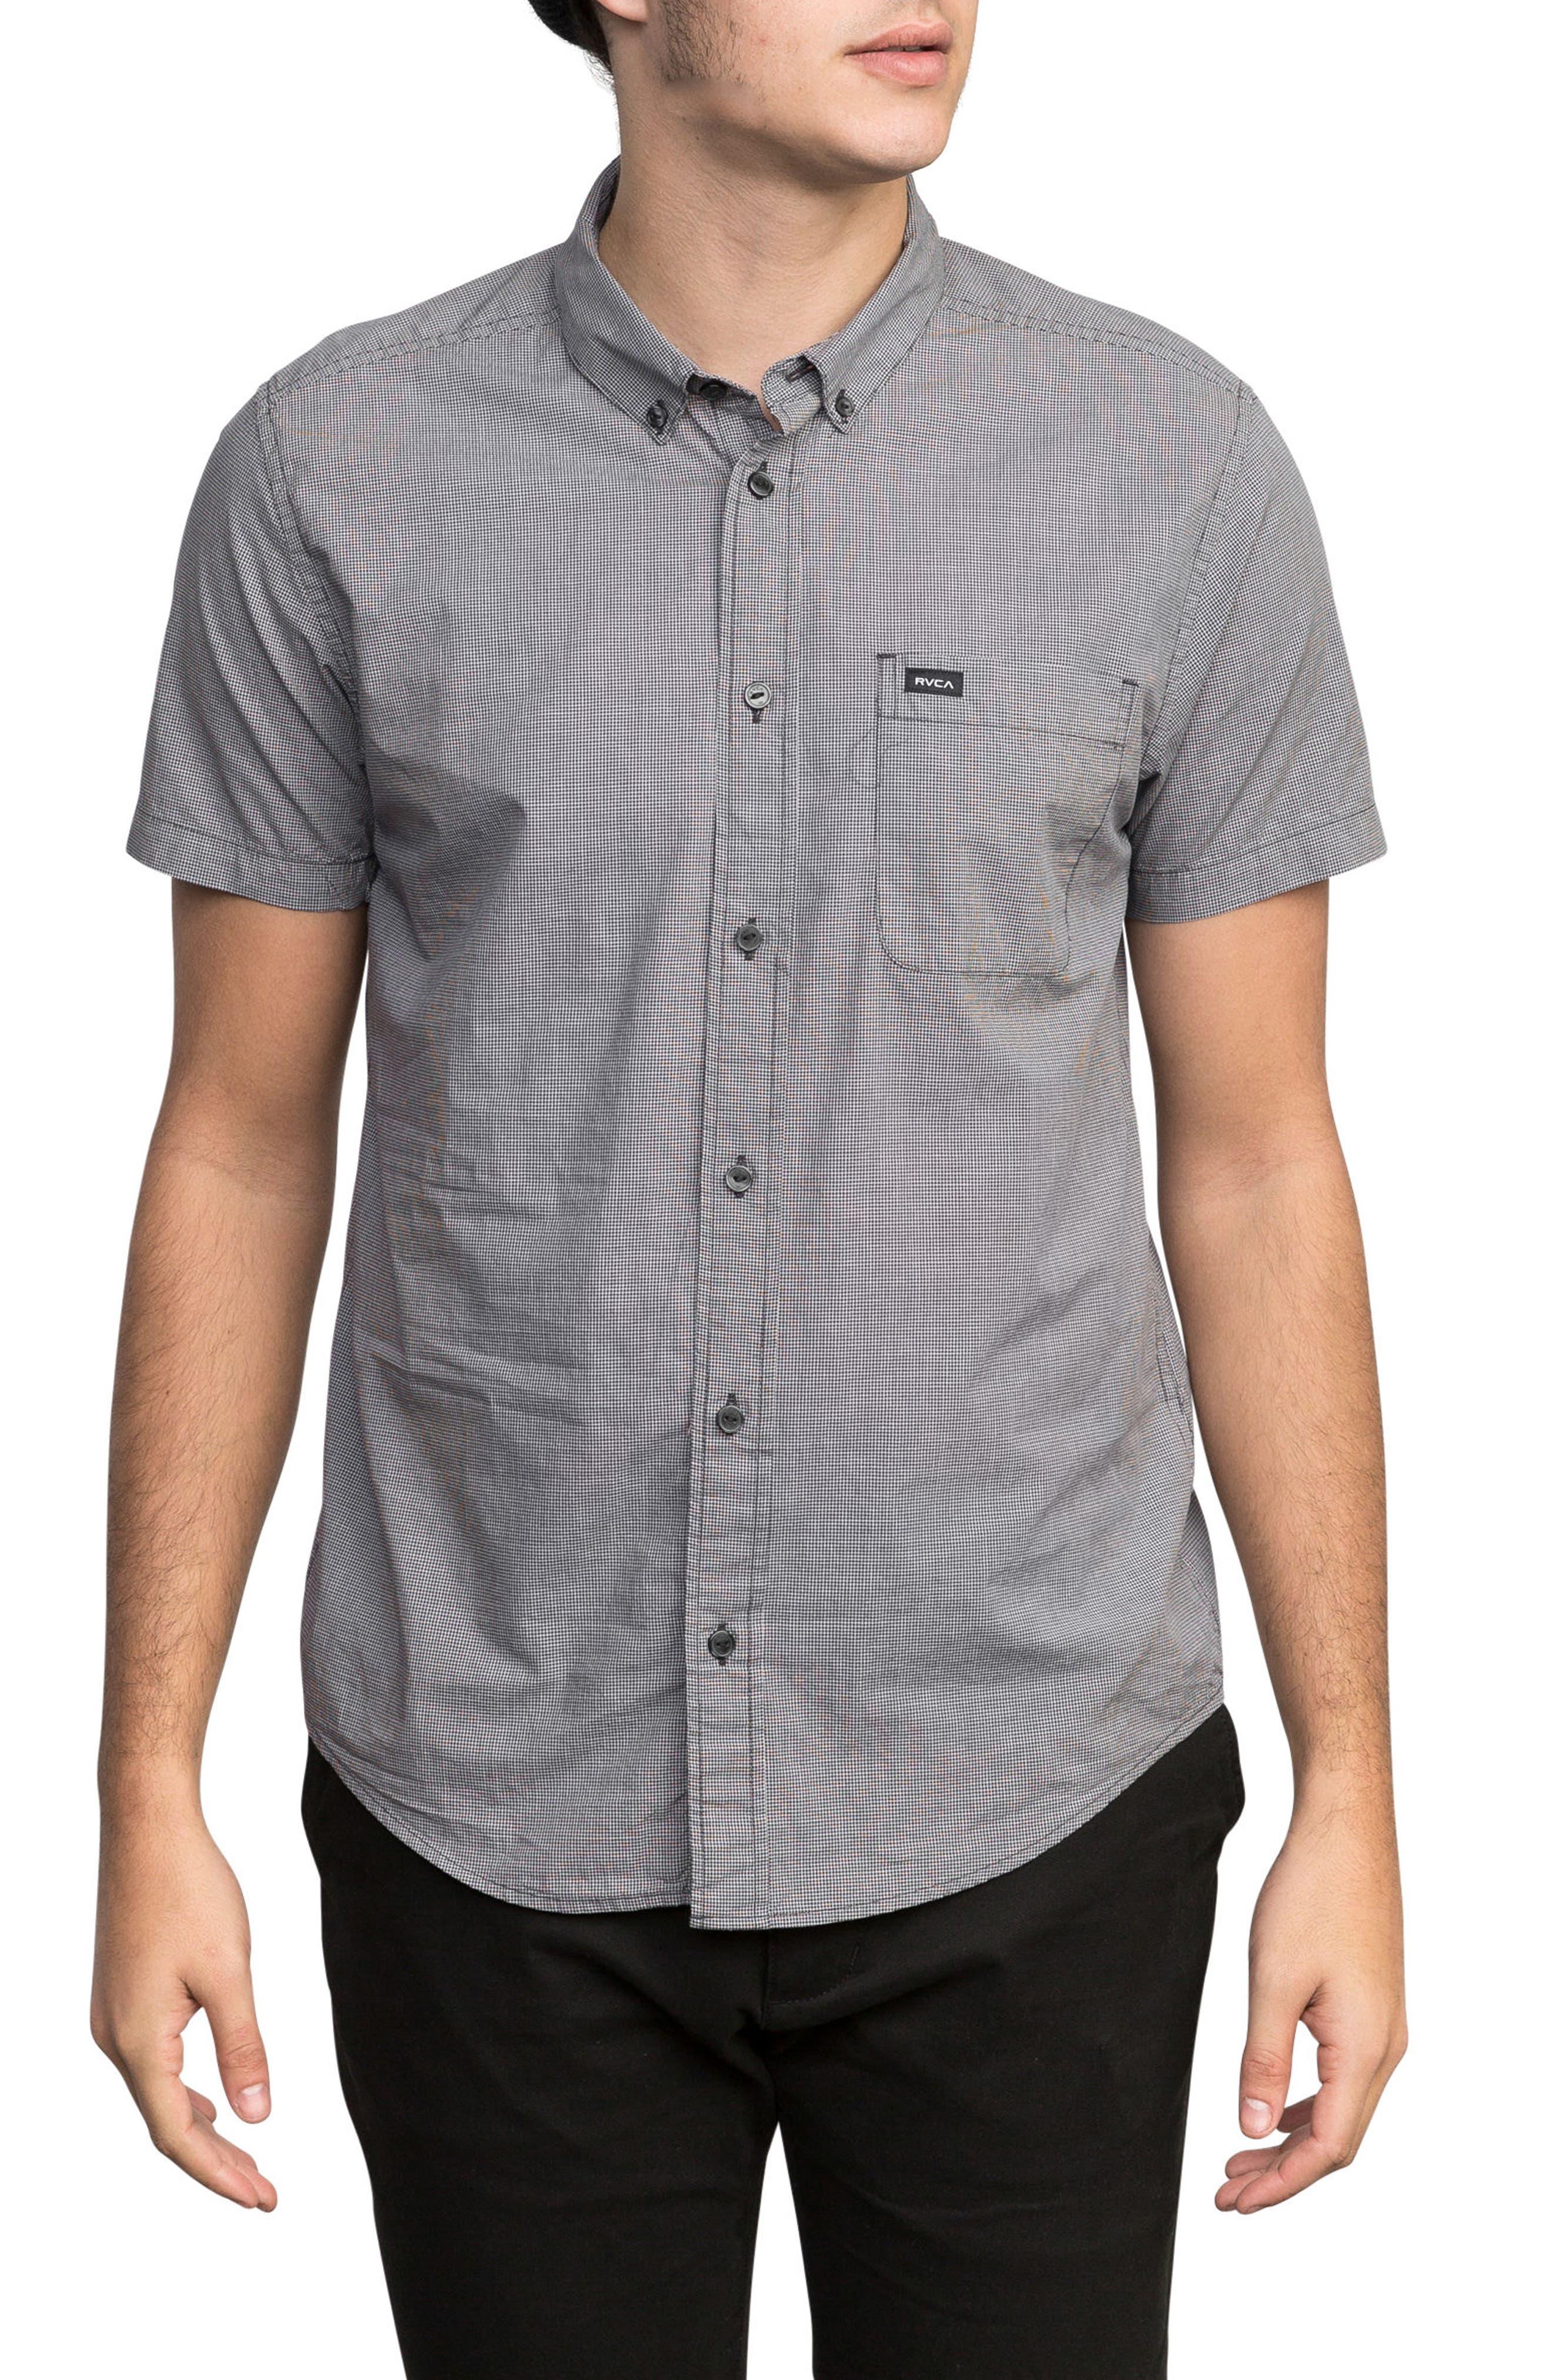 'That'll Do' Slim Fit Microdot Woven Shirt,                             Main thumbnail 1, color,                             Slate